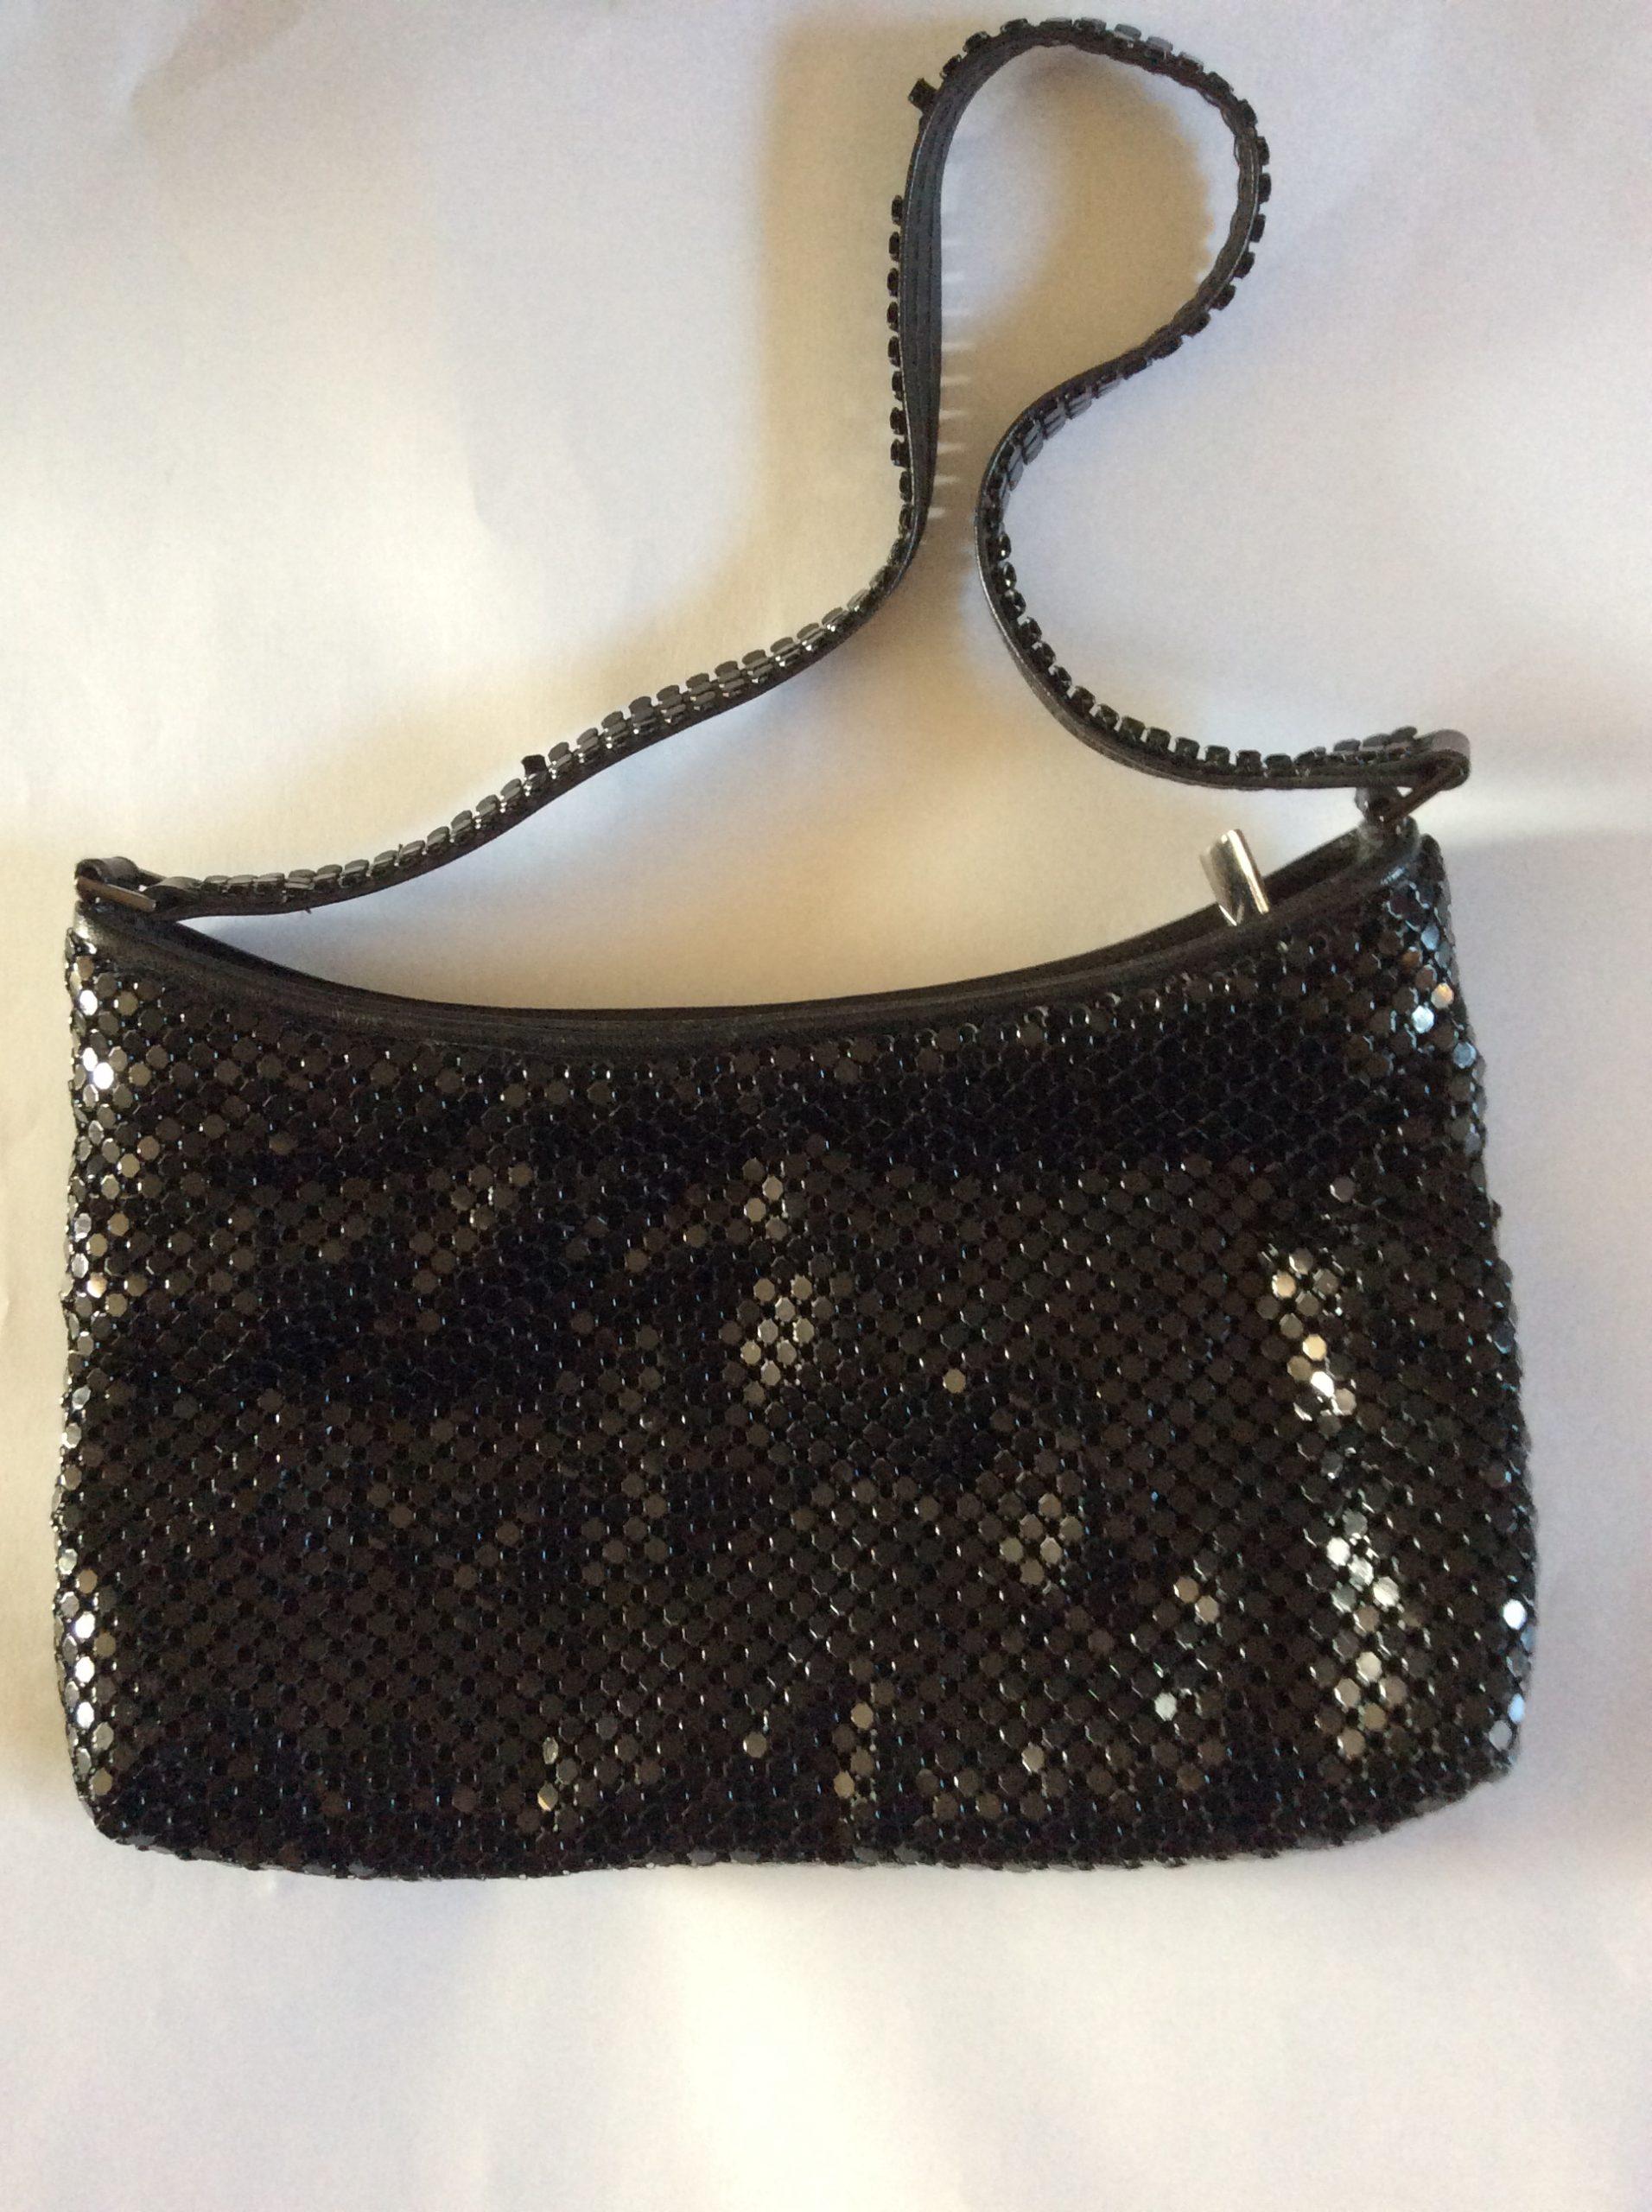 Small metallic black handbag